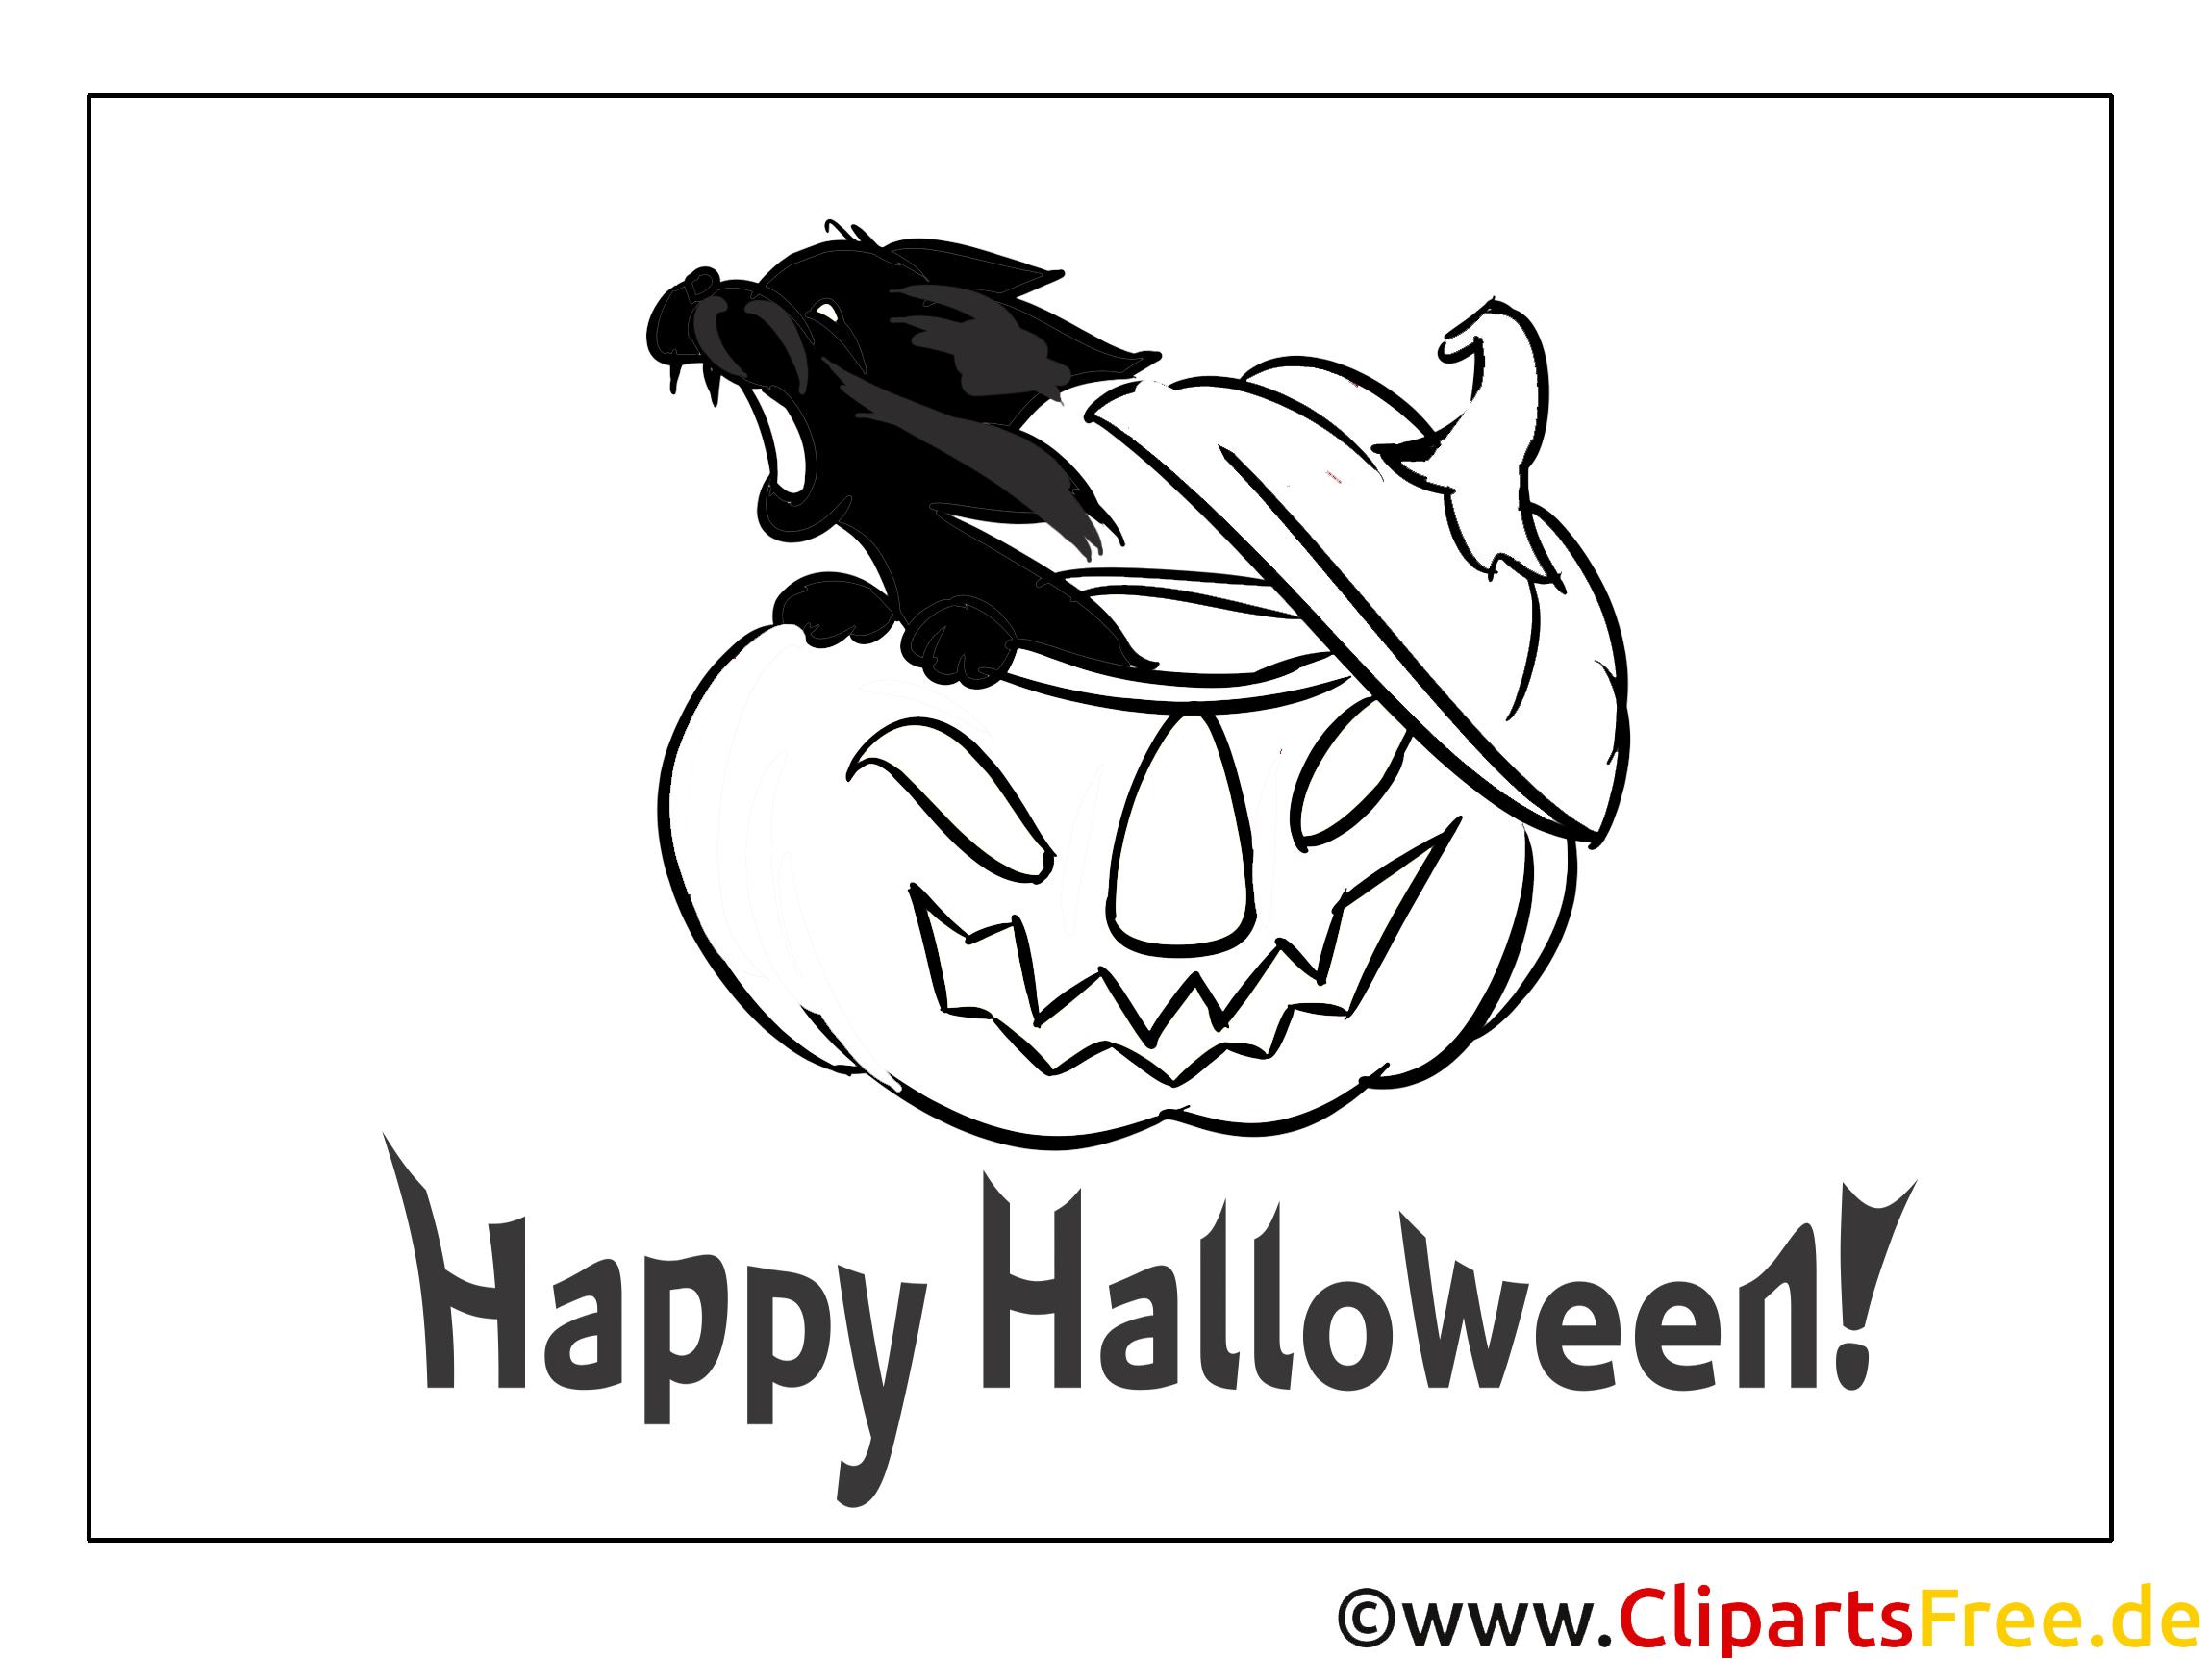 Schwarze Katze zum Halloween Bilder zum Ausmalen